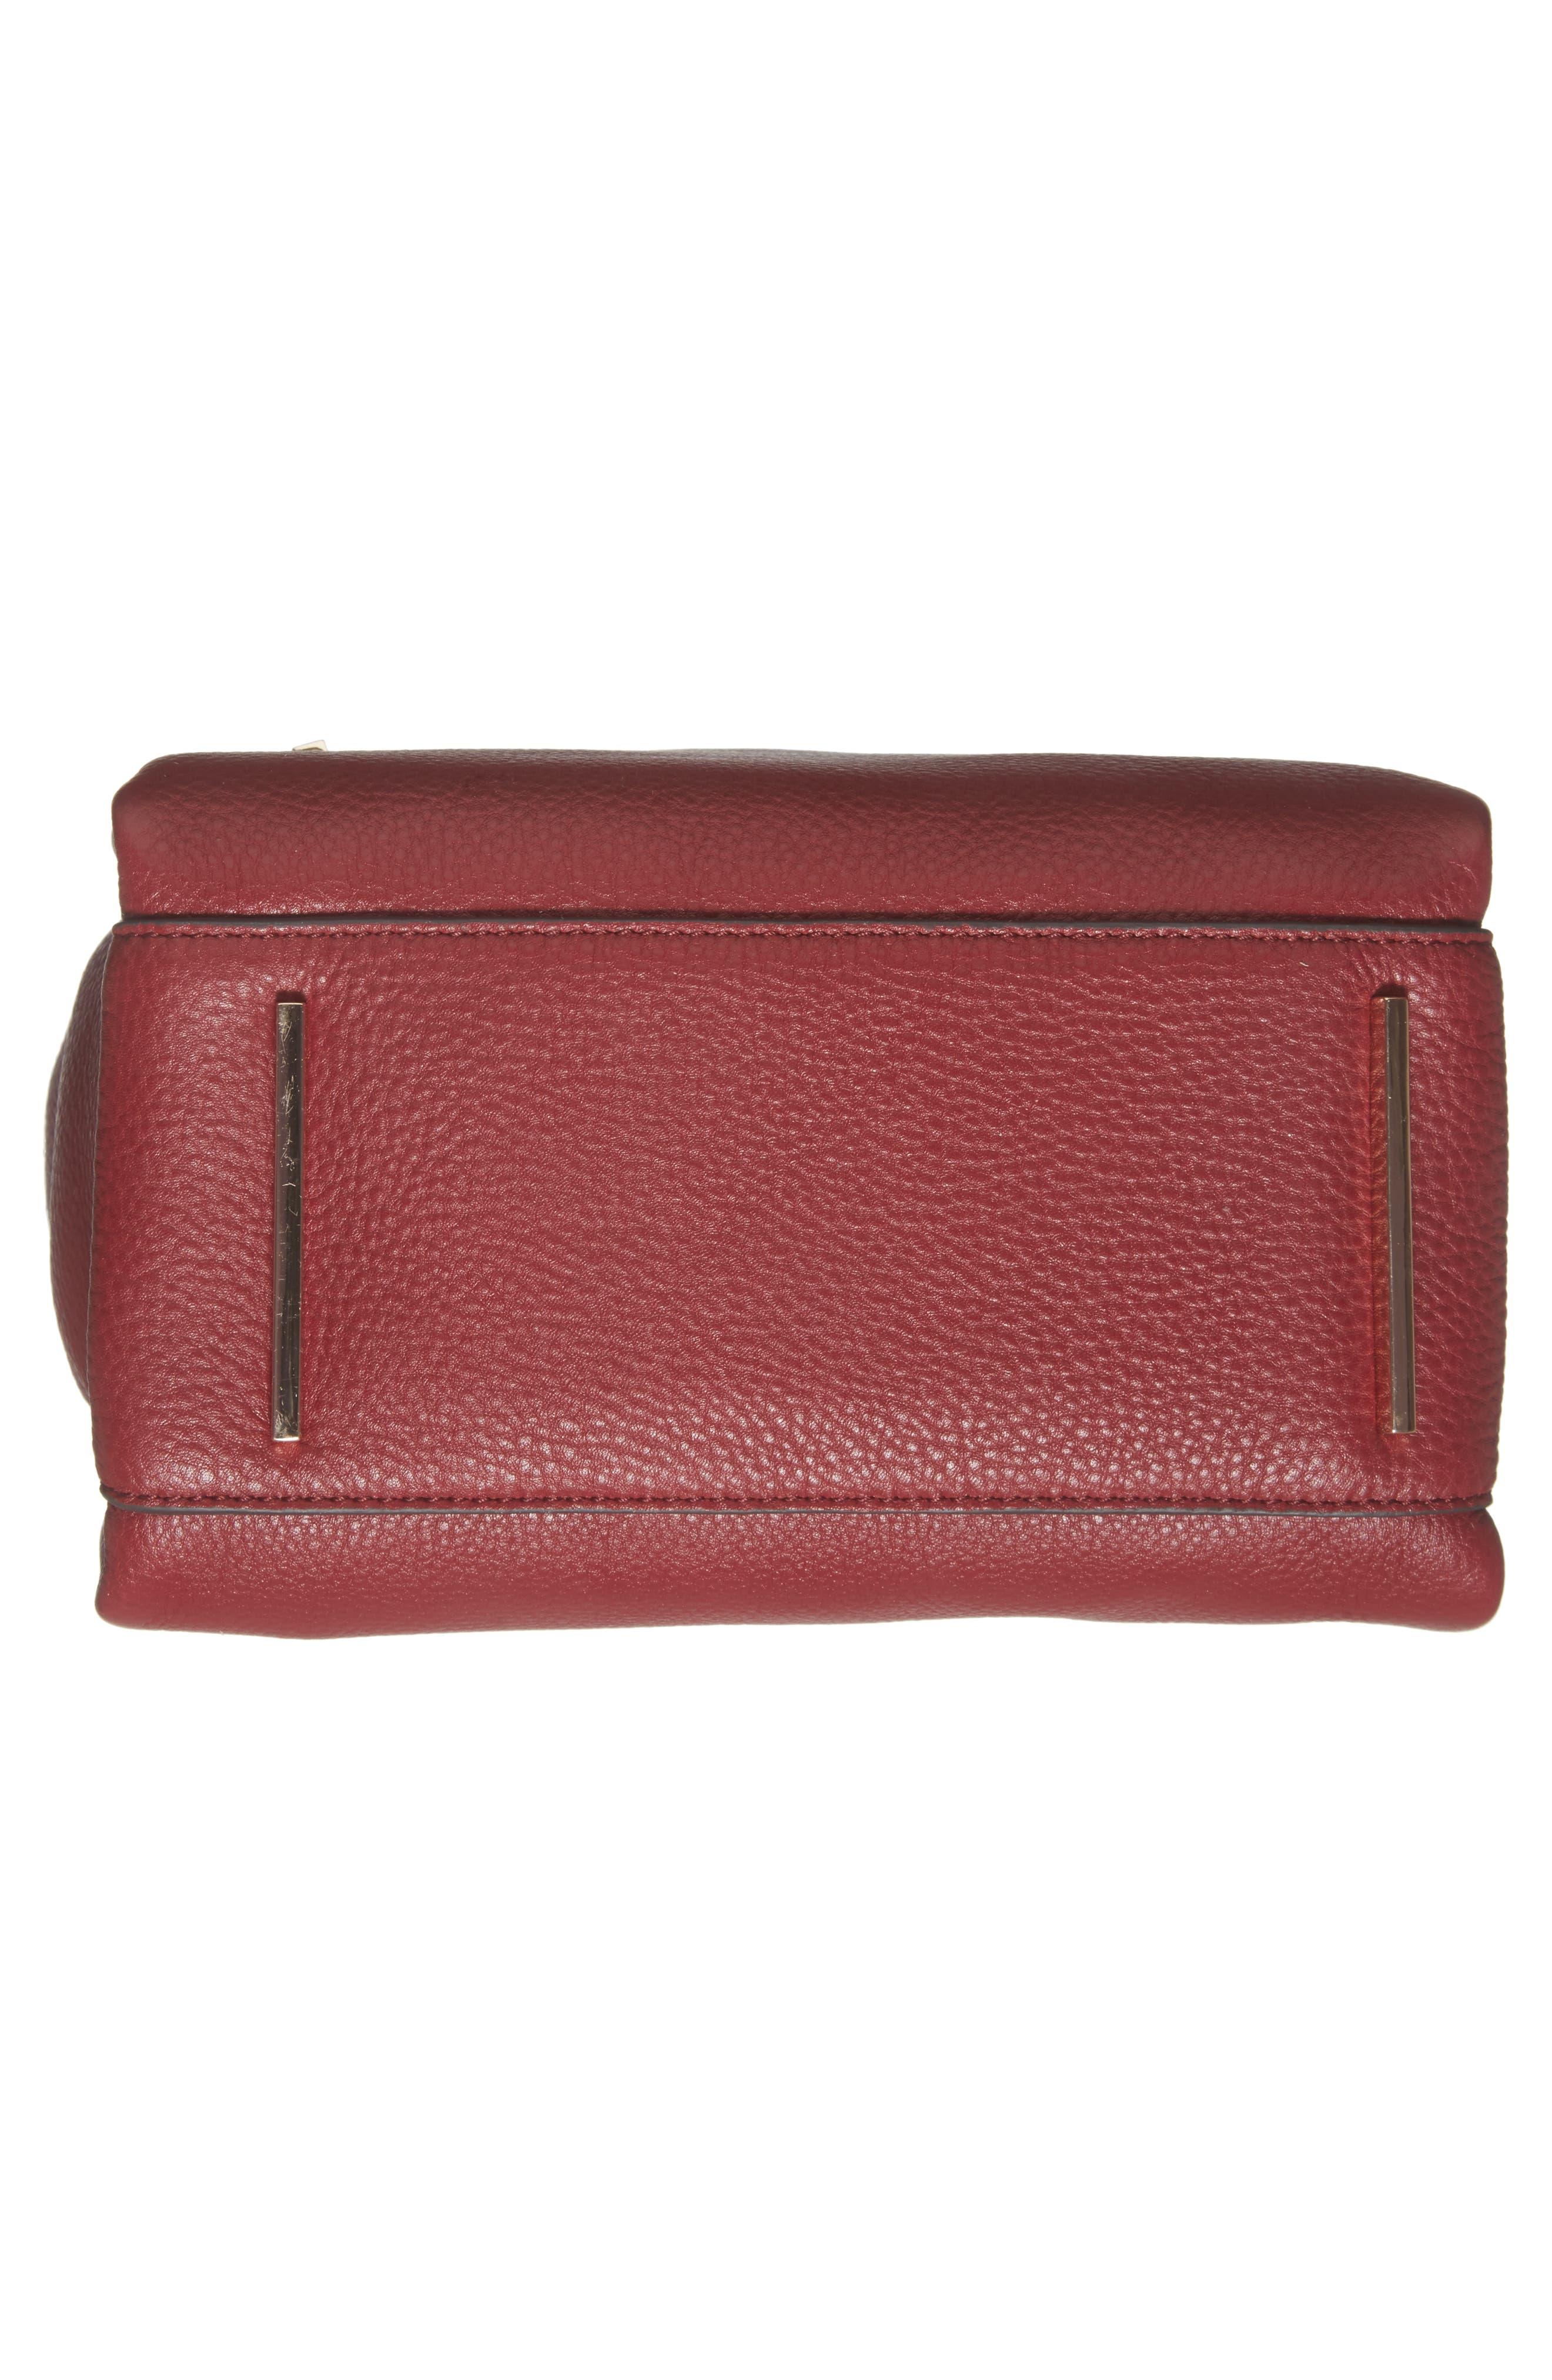 Céline Dion Small Adagio Leather Satchel,                             Alternate thumbnail 30, color,